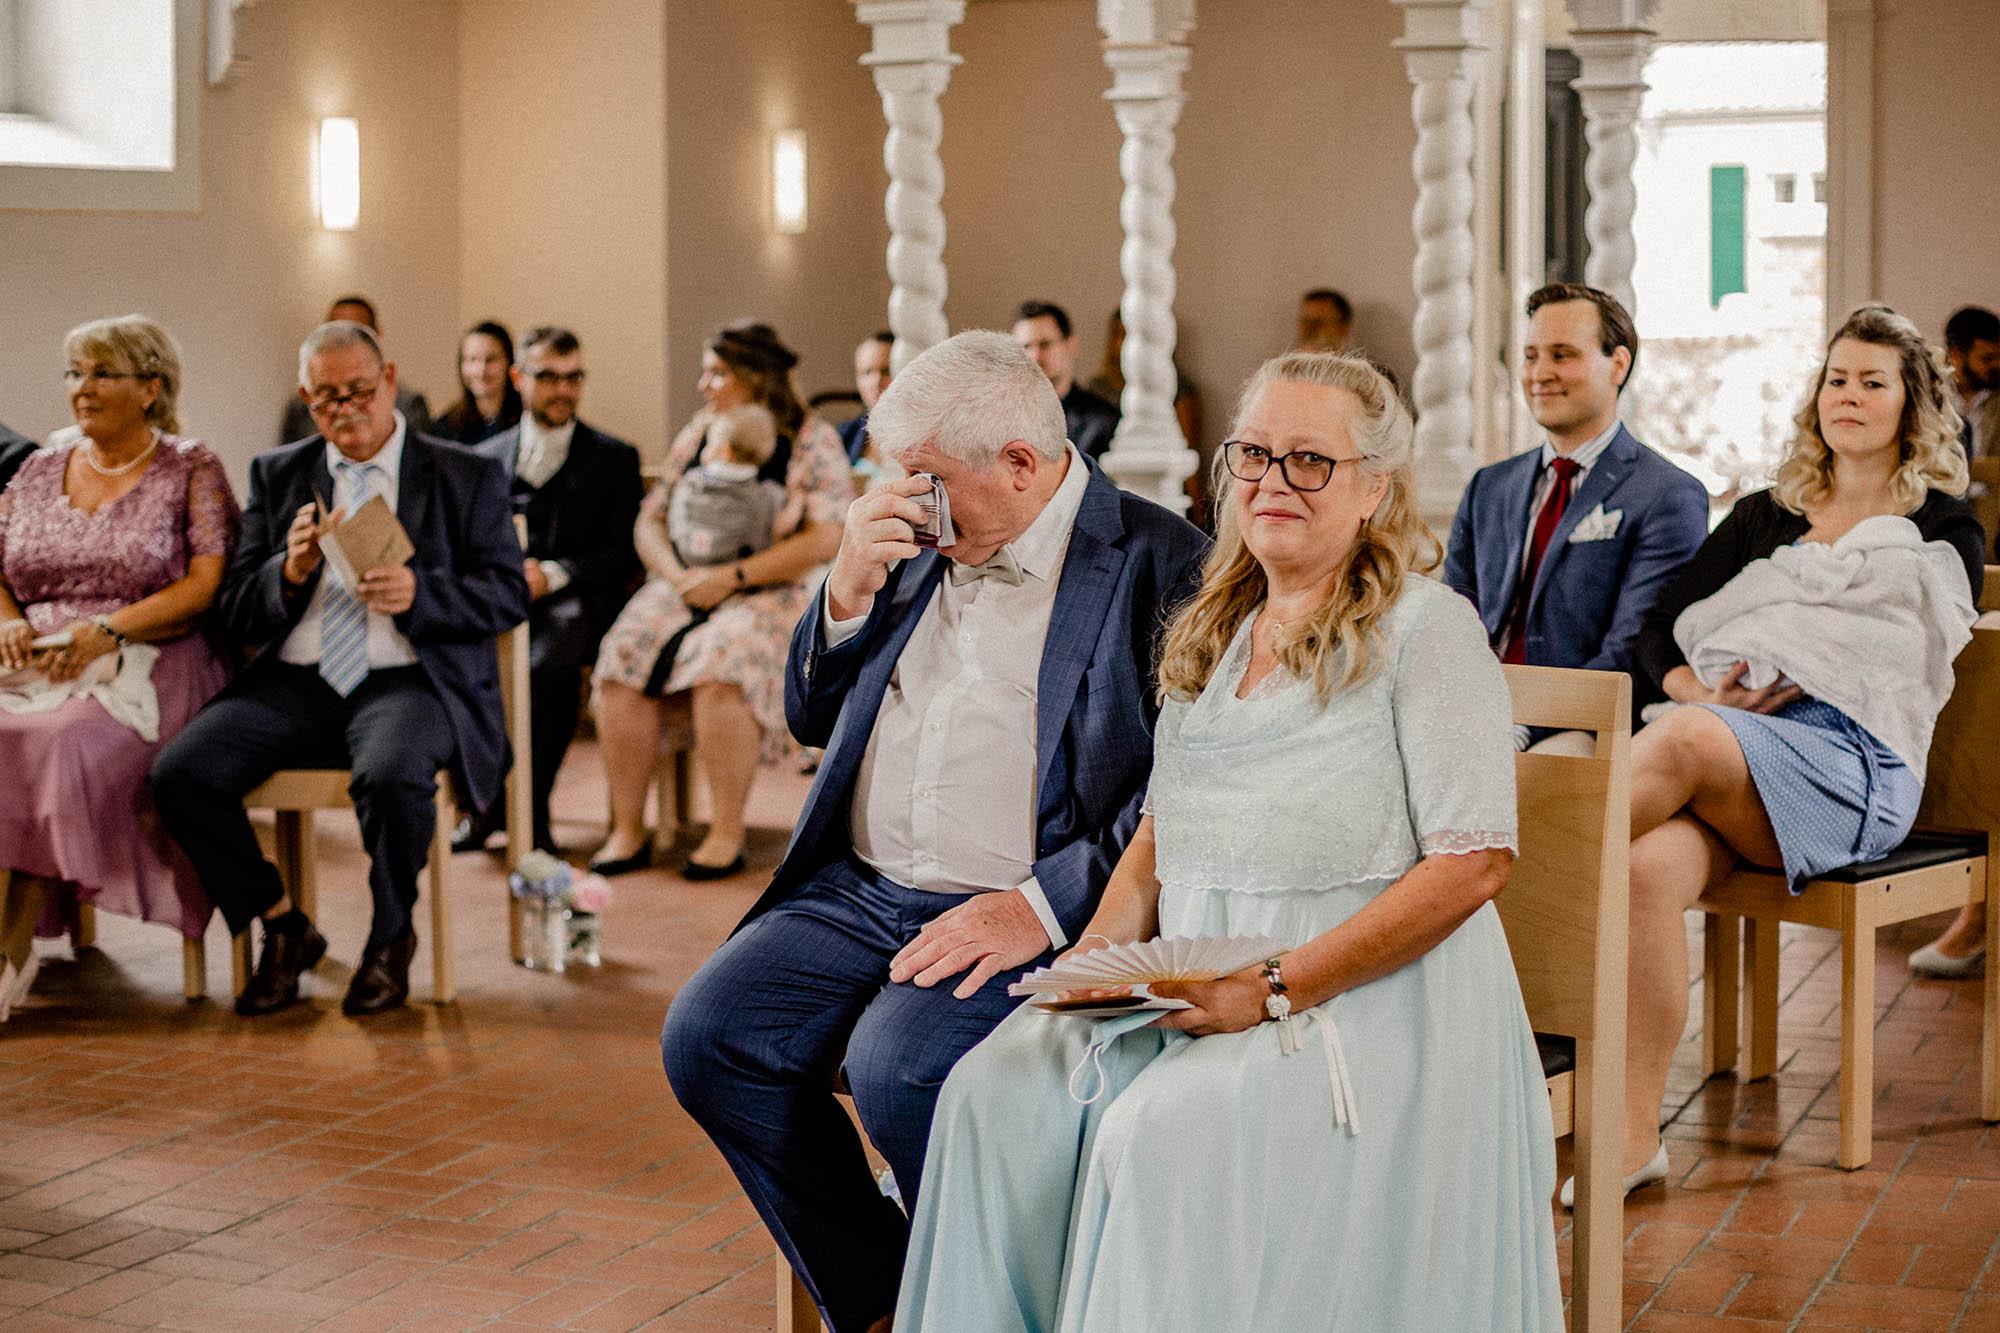 Virginia-Pech-Fotografie-Hochzeitsfotograf-Hochzeitsfotografie-Kulturscheune-Rangsdorf-Berlin-Anika-Nico-20